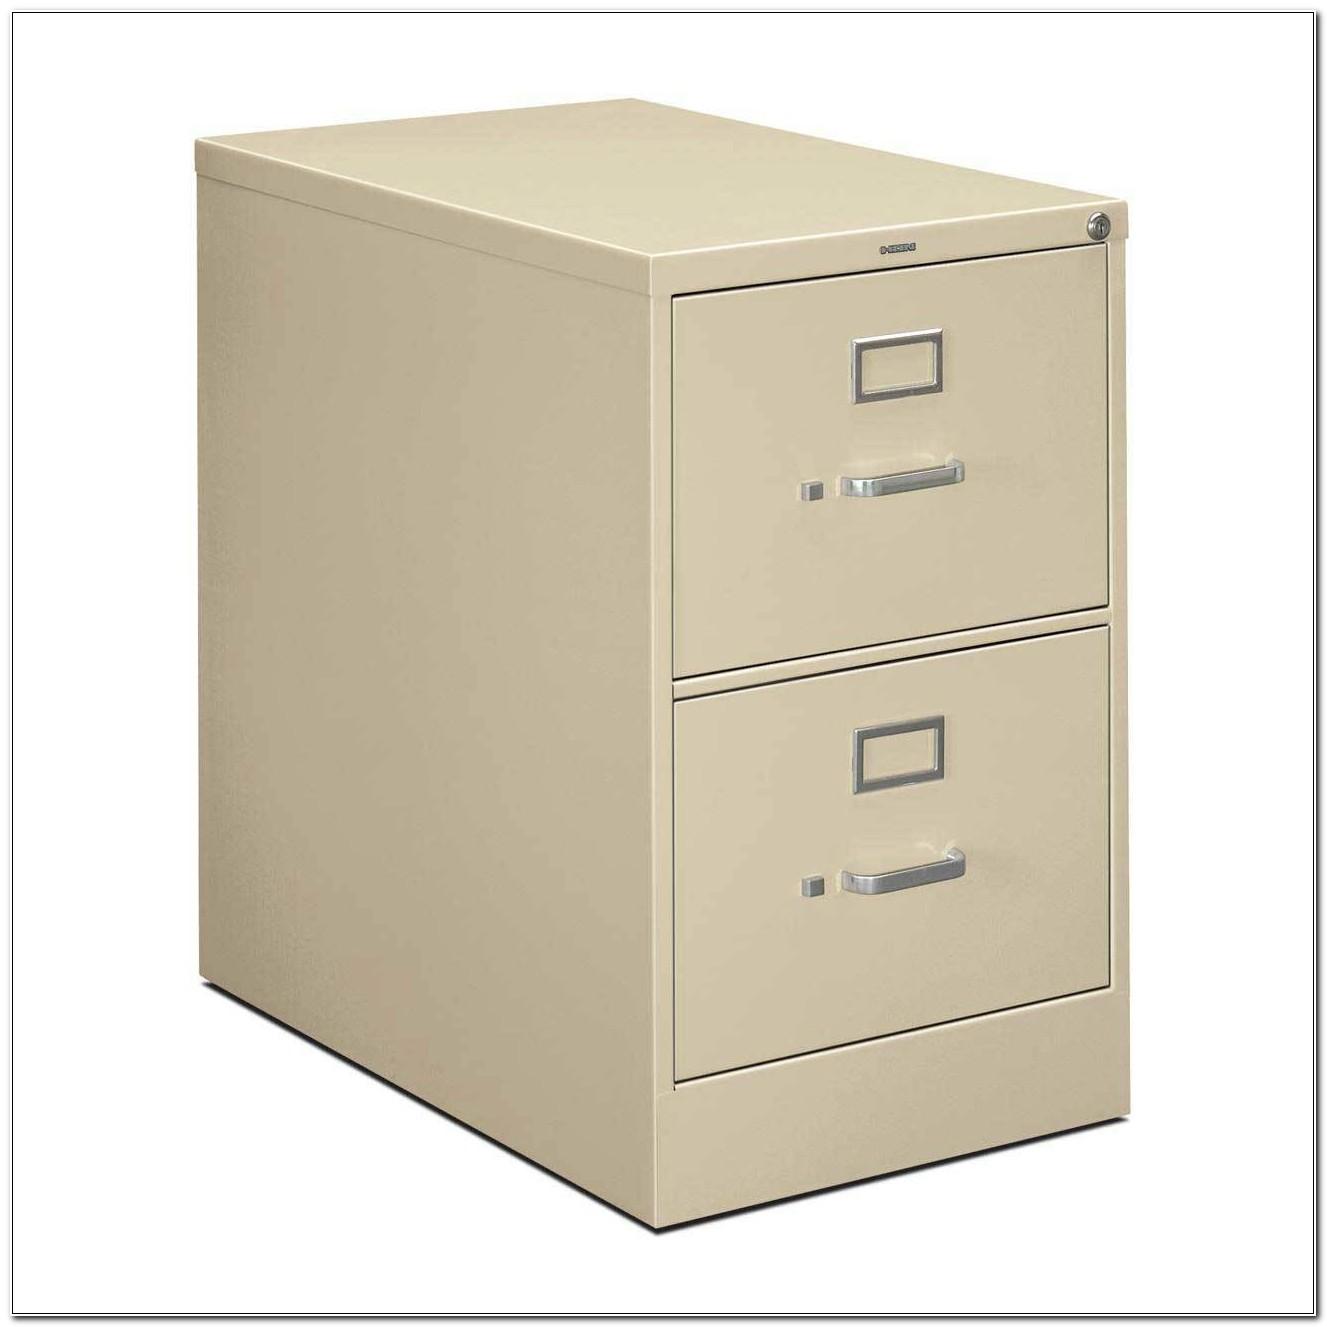 2 Drawer Metal Filing Cabinet With Lock